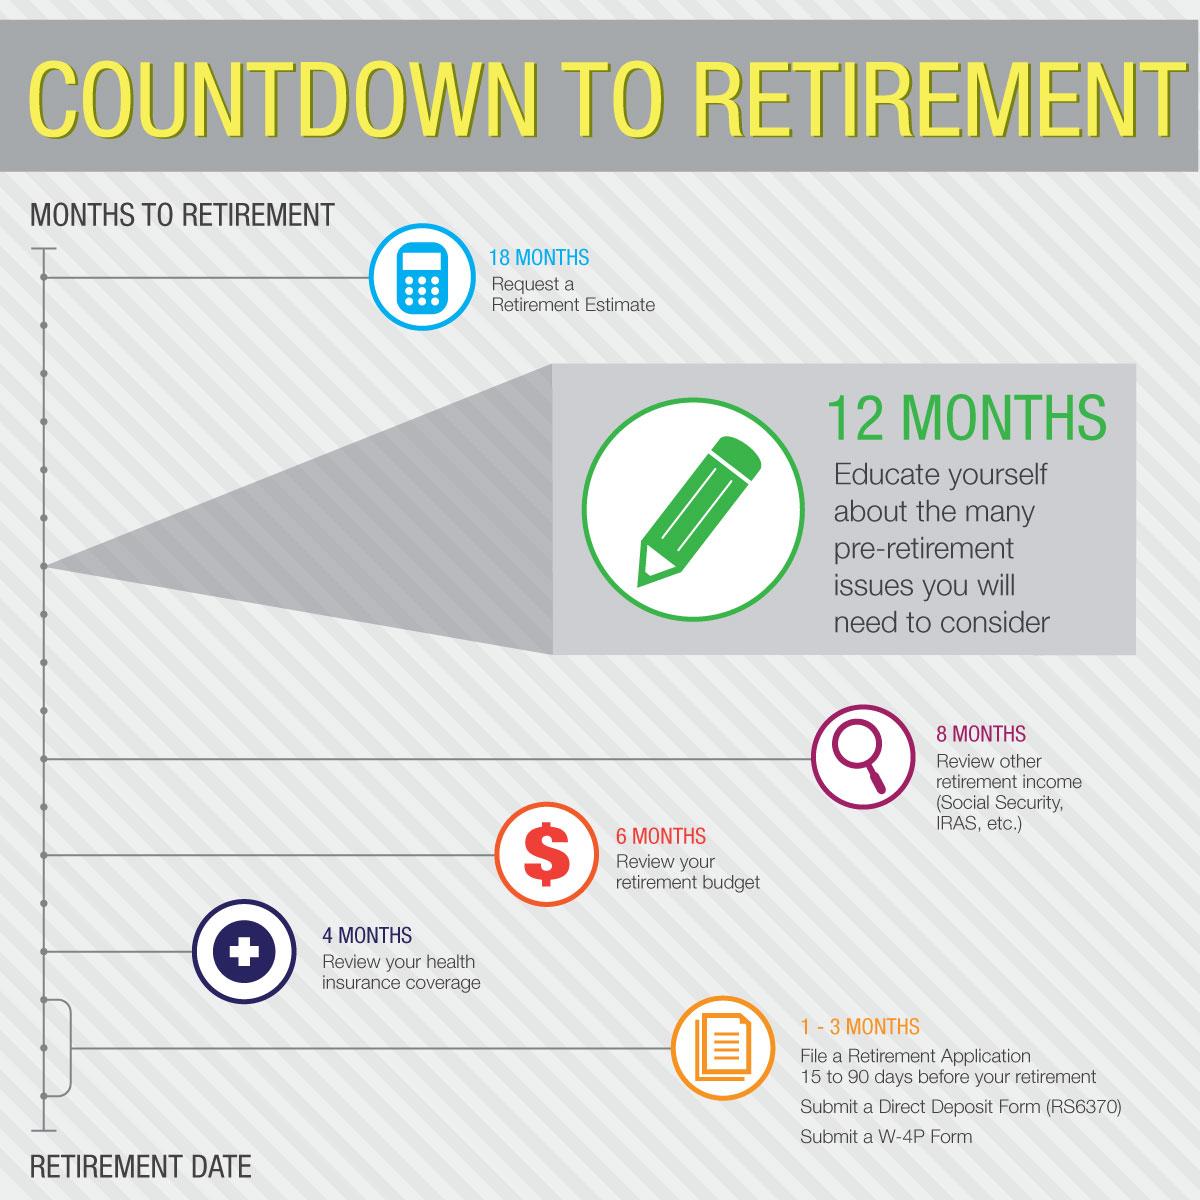 Free Retirement Countdown Calendar For 2016 | Calendar Template 2016